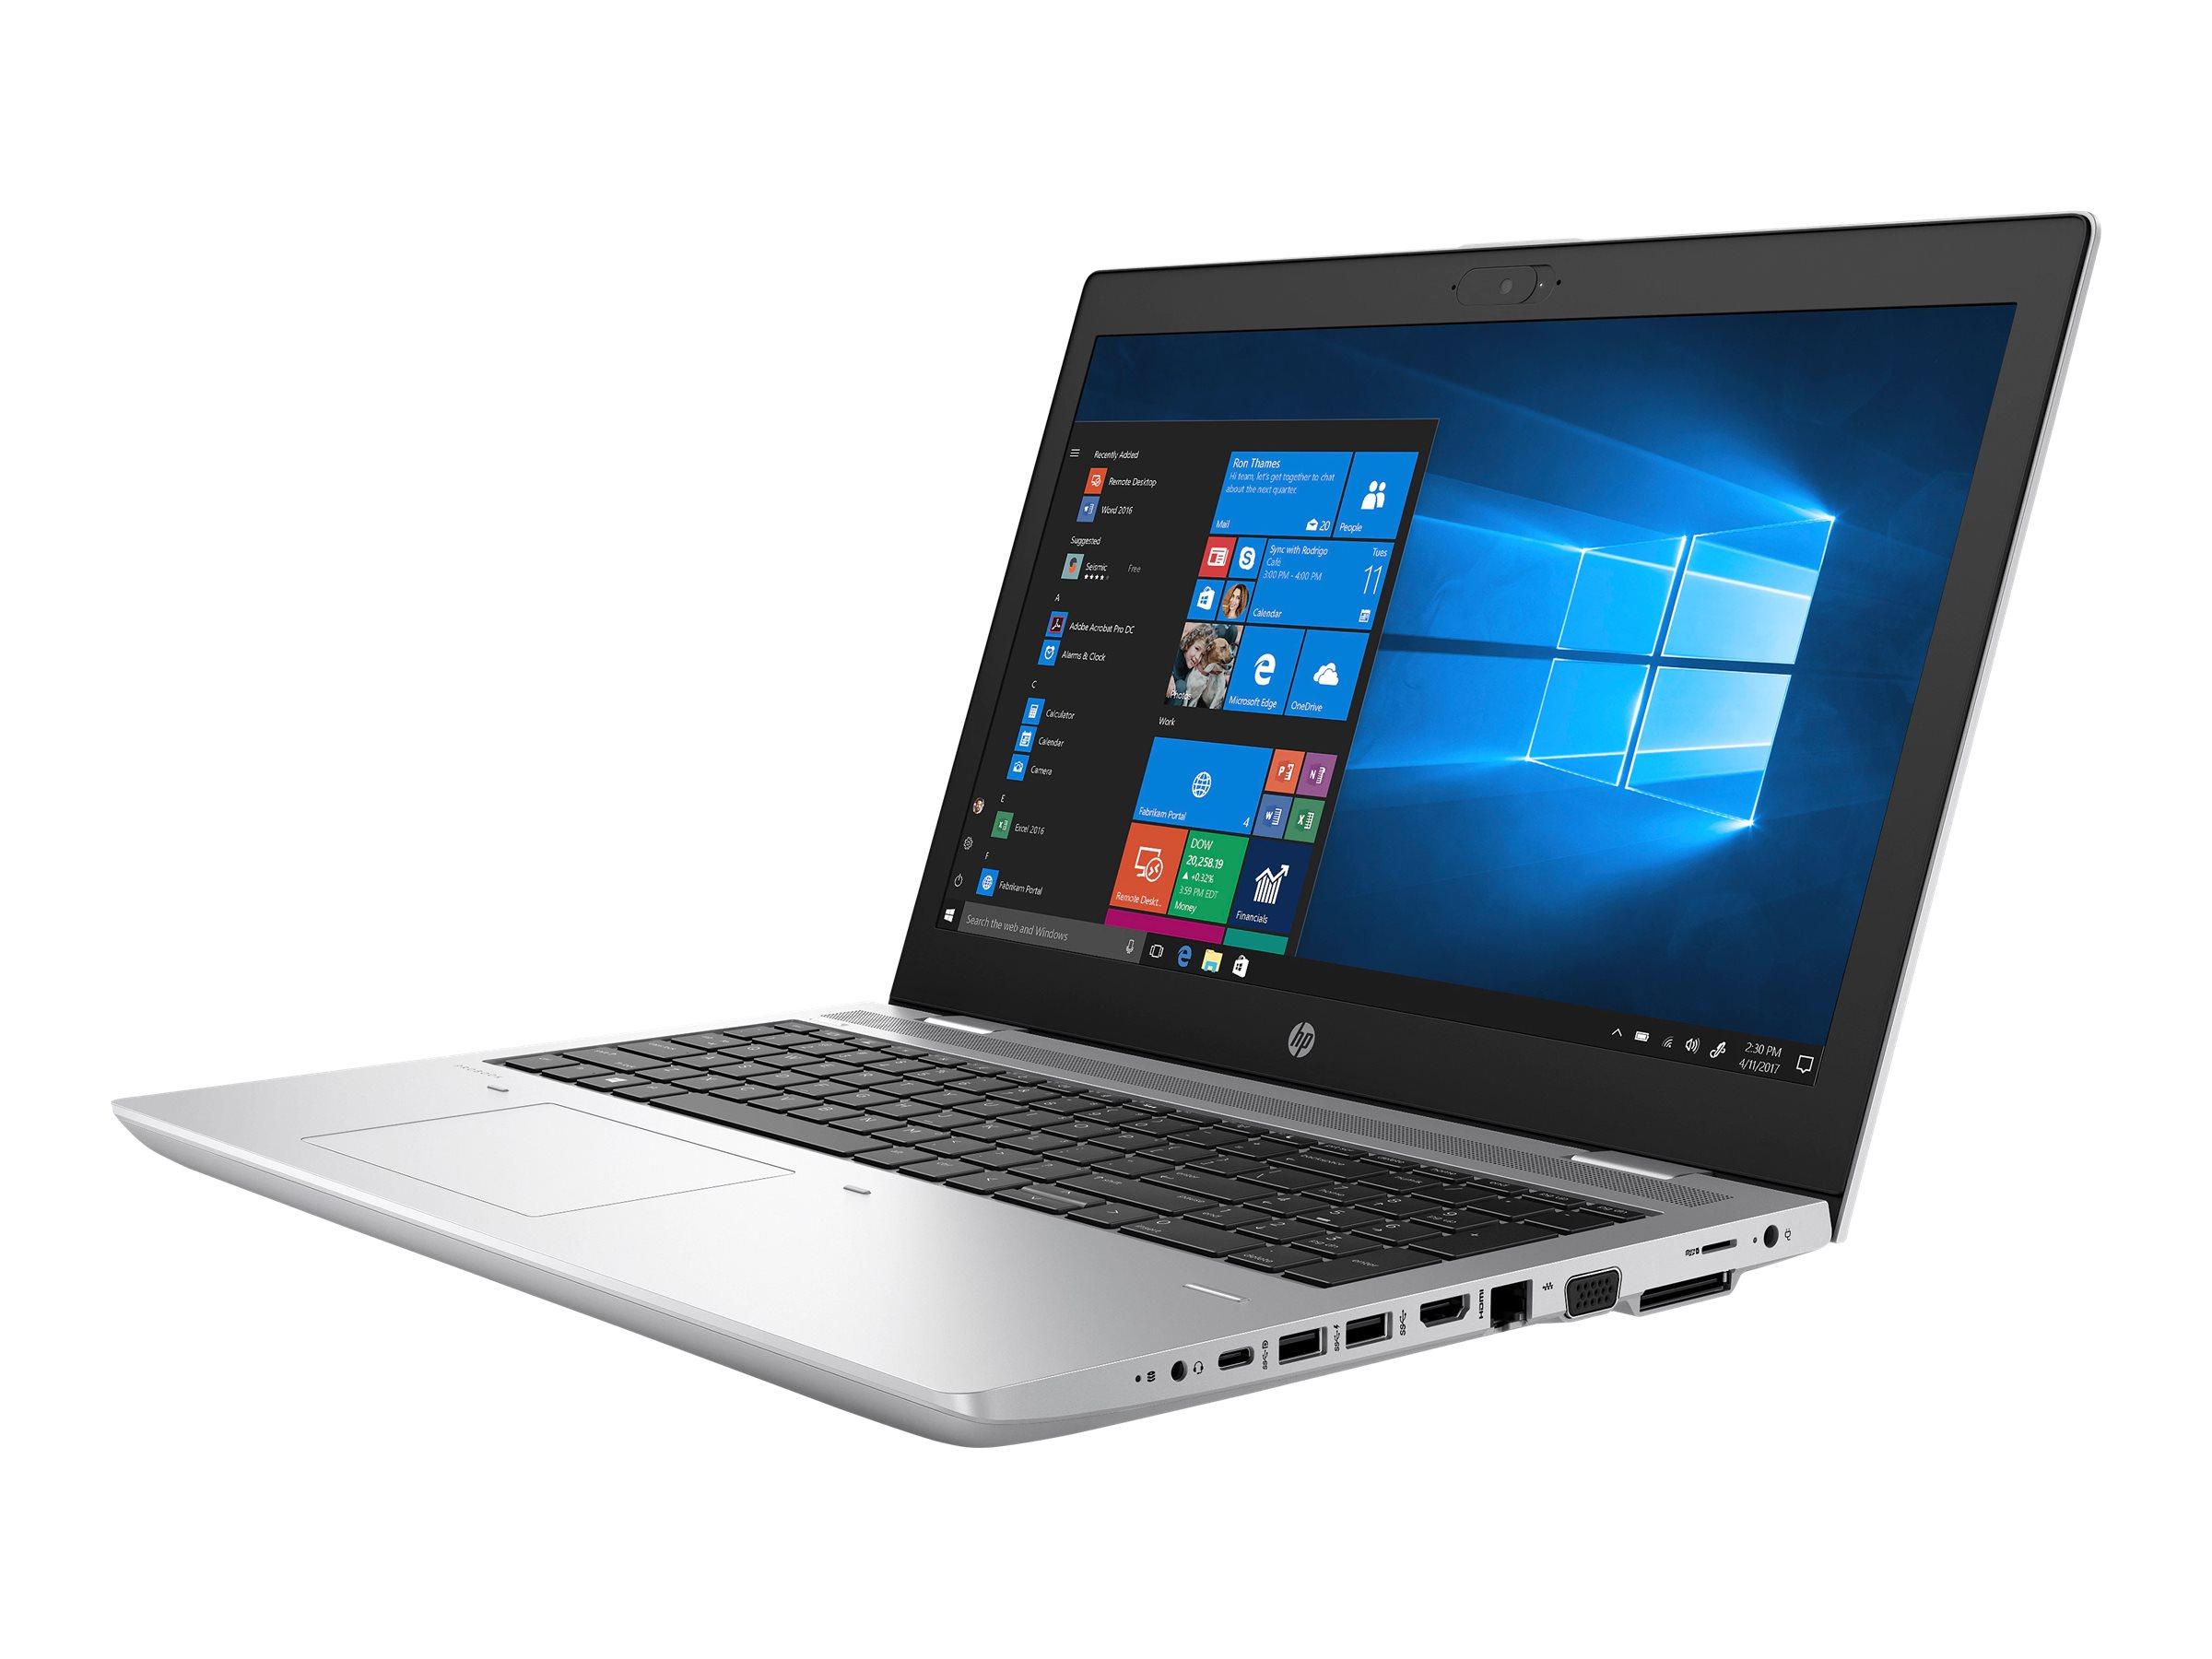 Hp probook 650 g4 core i5 8250u 1 6 ghz win 10 pro 64 bit 8 gb ram 256 gb ssd nvme tlc dvd writer 8696261 3up57ea abd